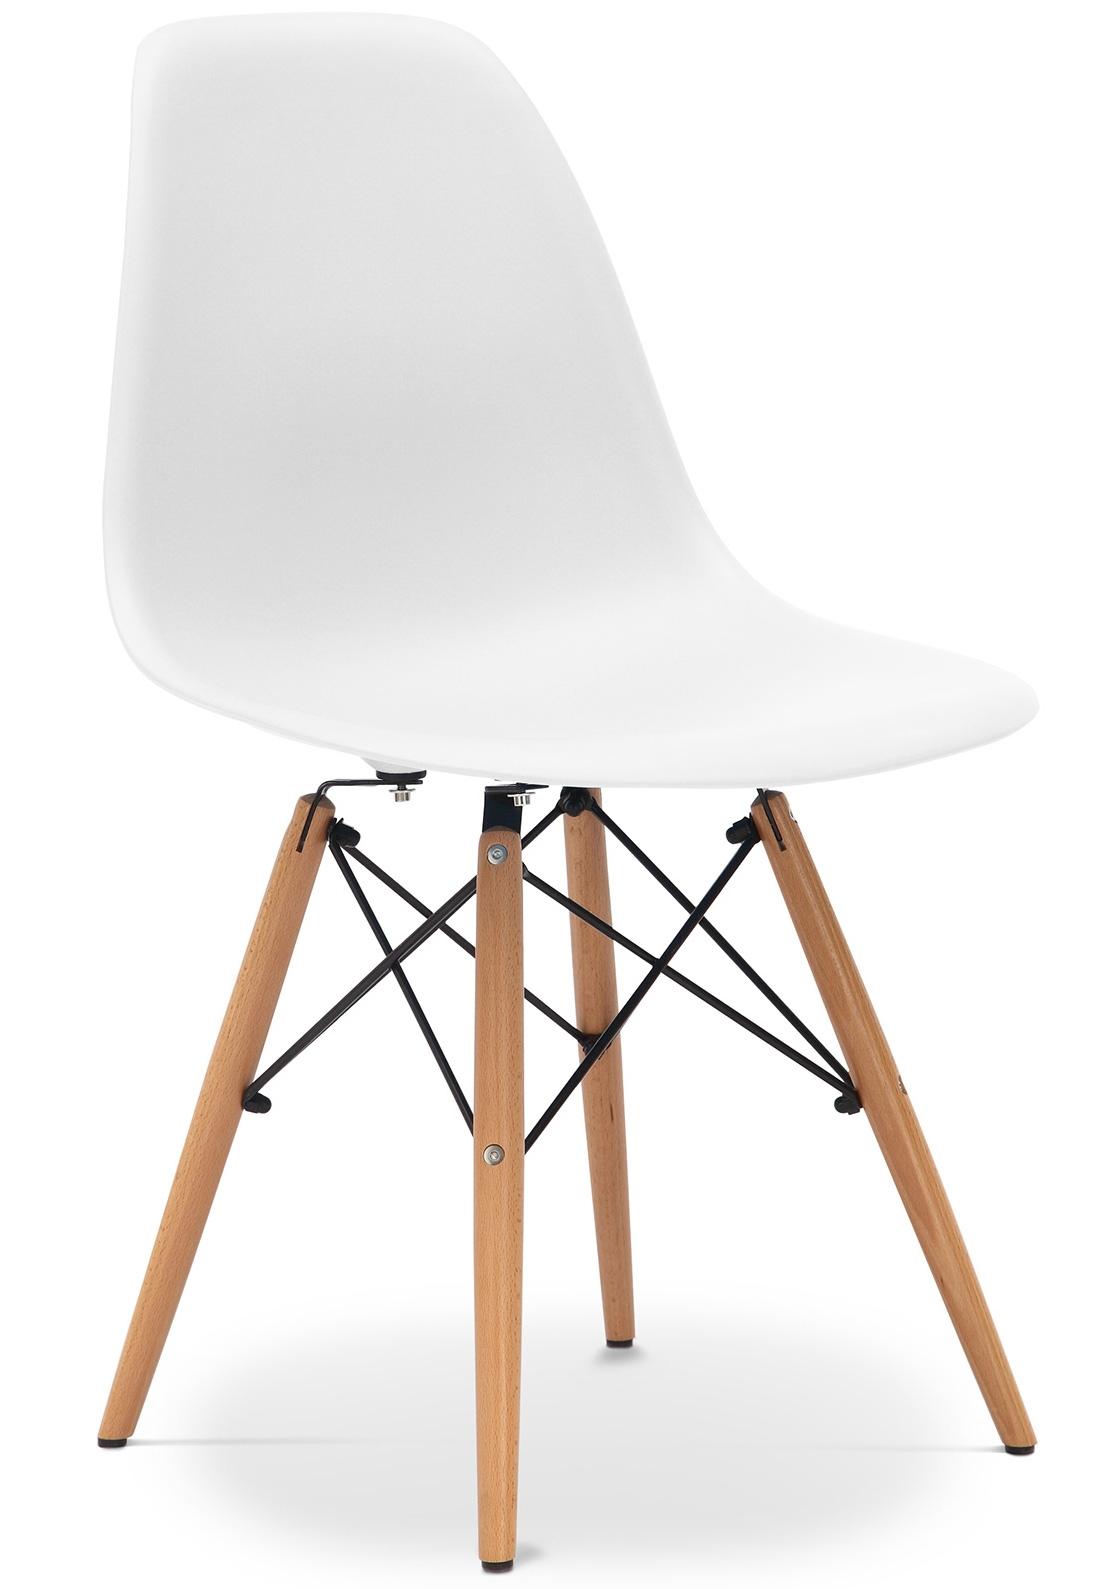 chaise polypropyl ne blanc mat et pieds h tre clair inspir e dsw. Black Bedroom Furniture Sets. Home Design Ideas